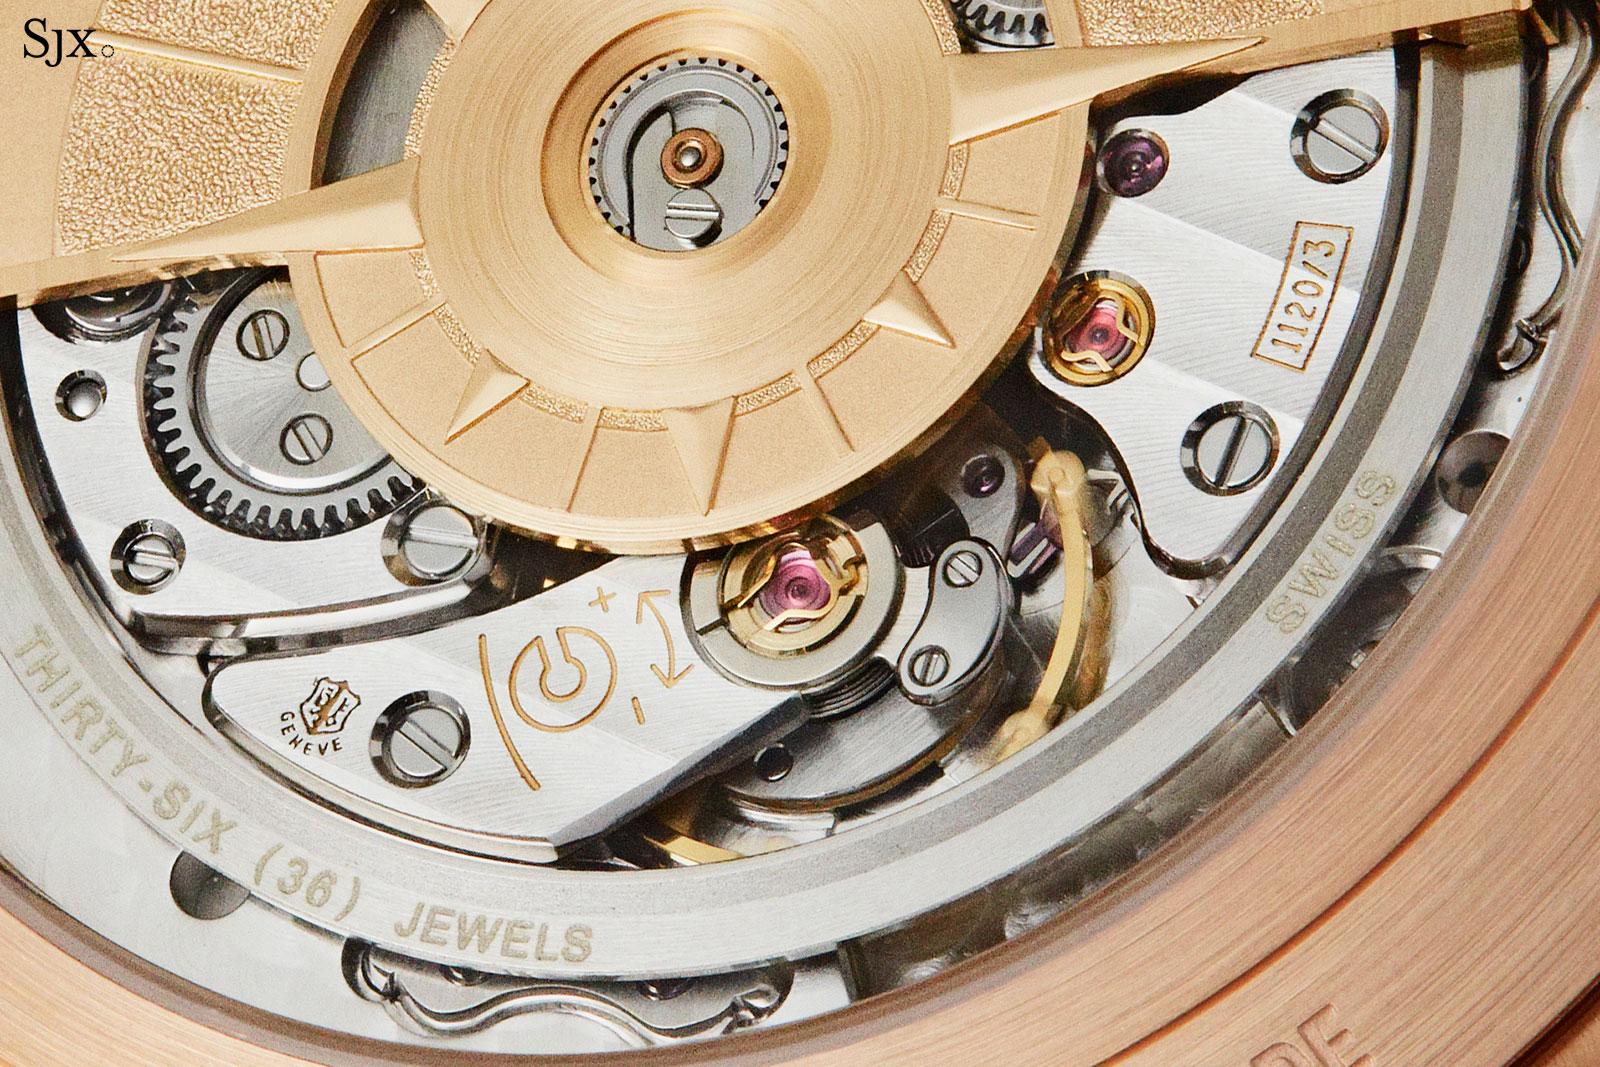 Vacheron Overseas Perpetual Calendar pink gold 5